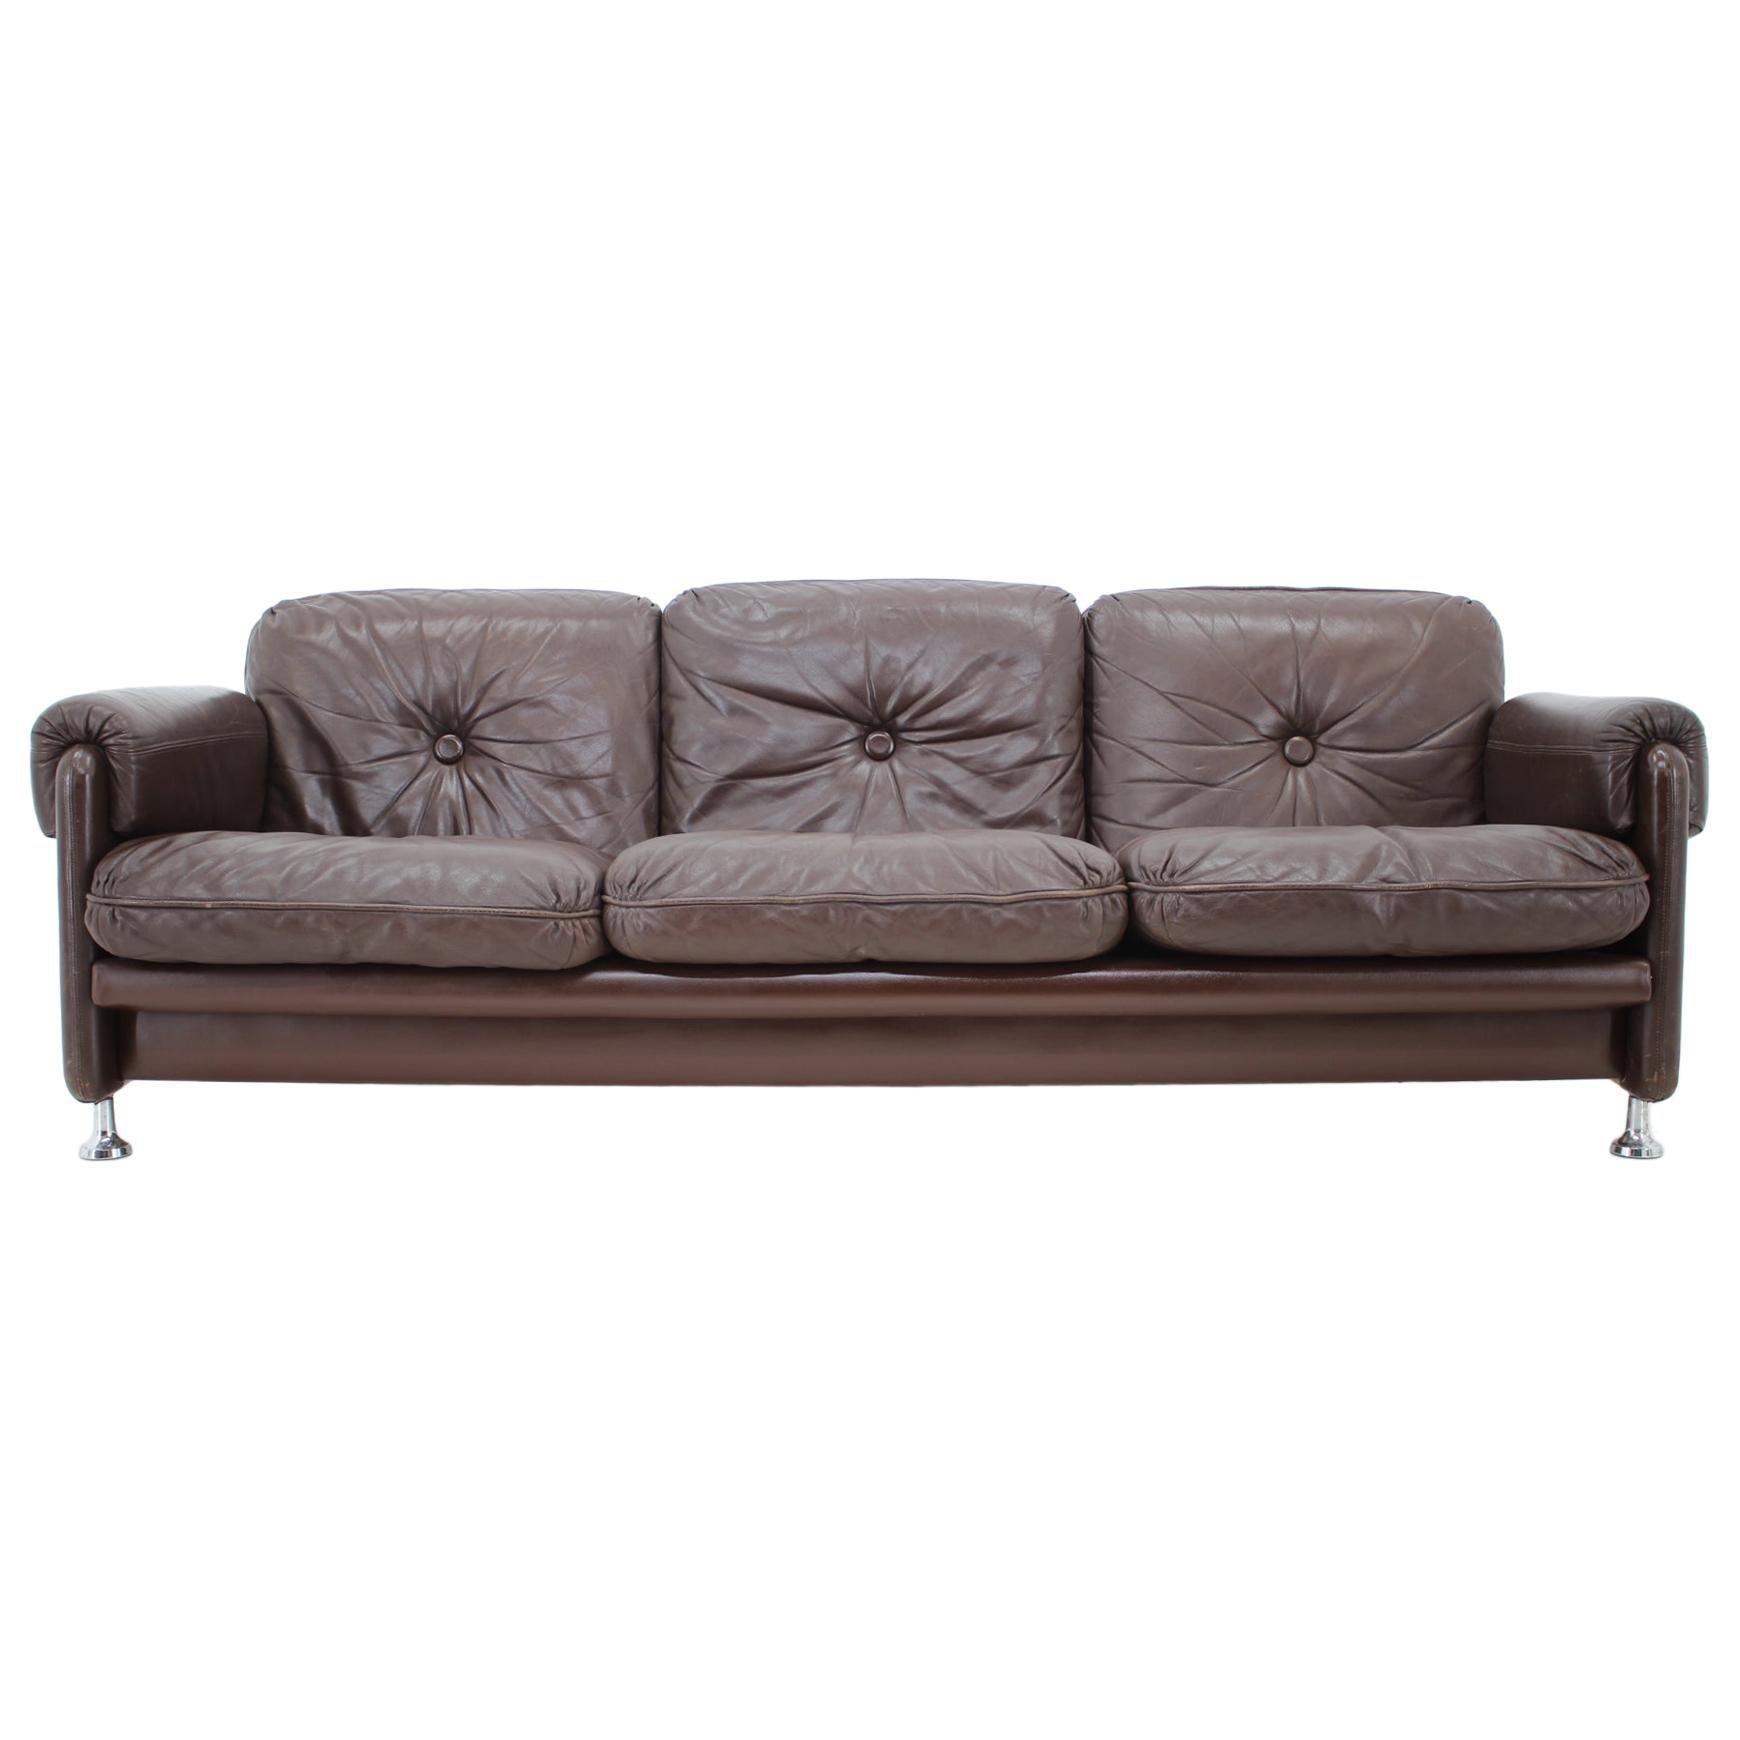 Midcentury Scandinavian Leather Sofa for MYRSKYLÄ OY, Finland, 1960s